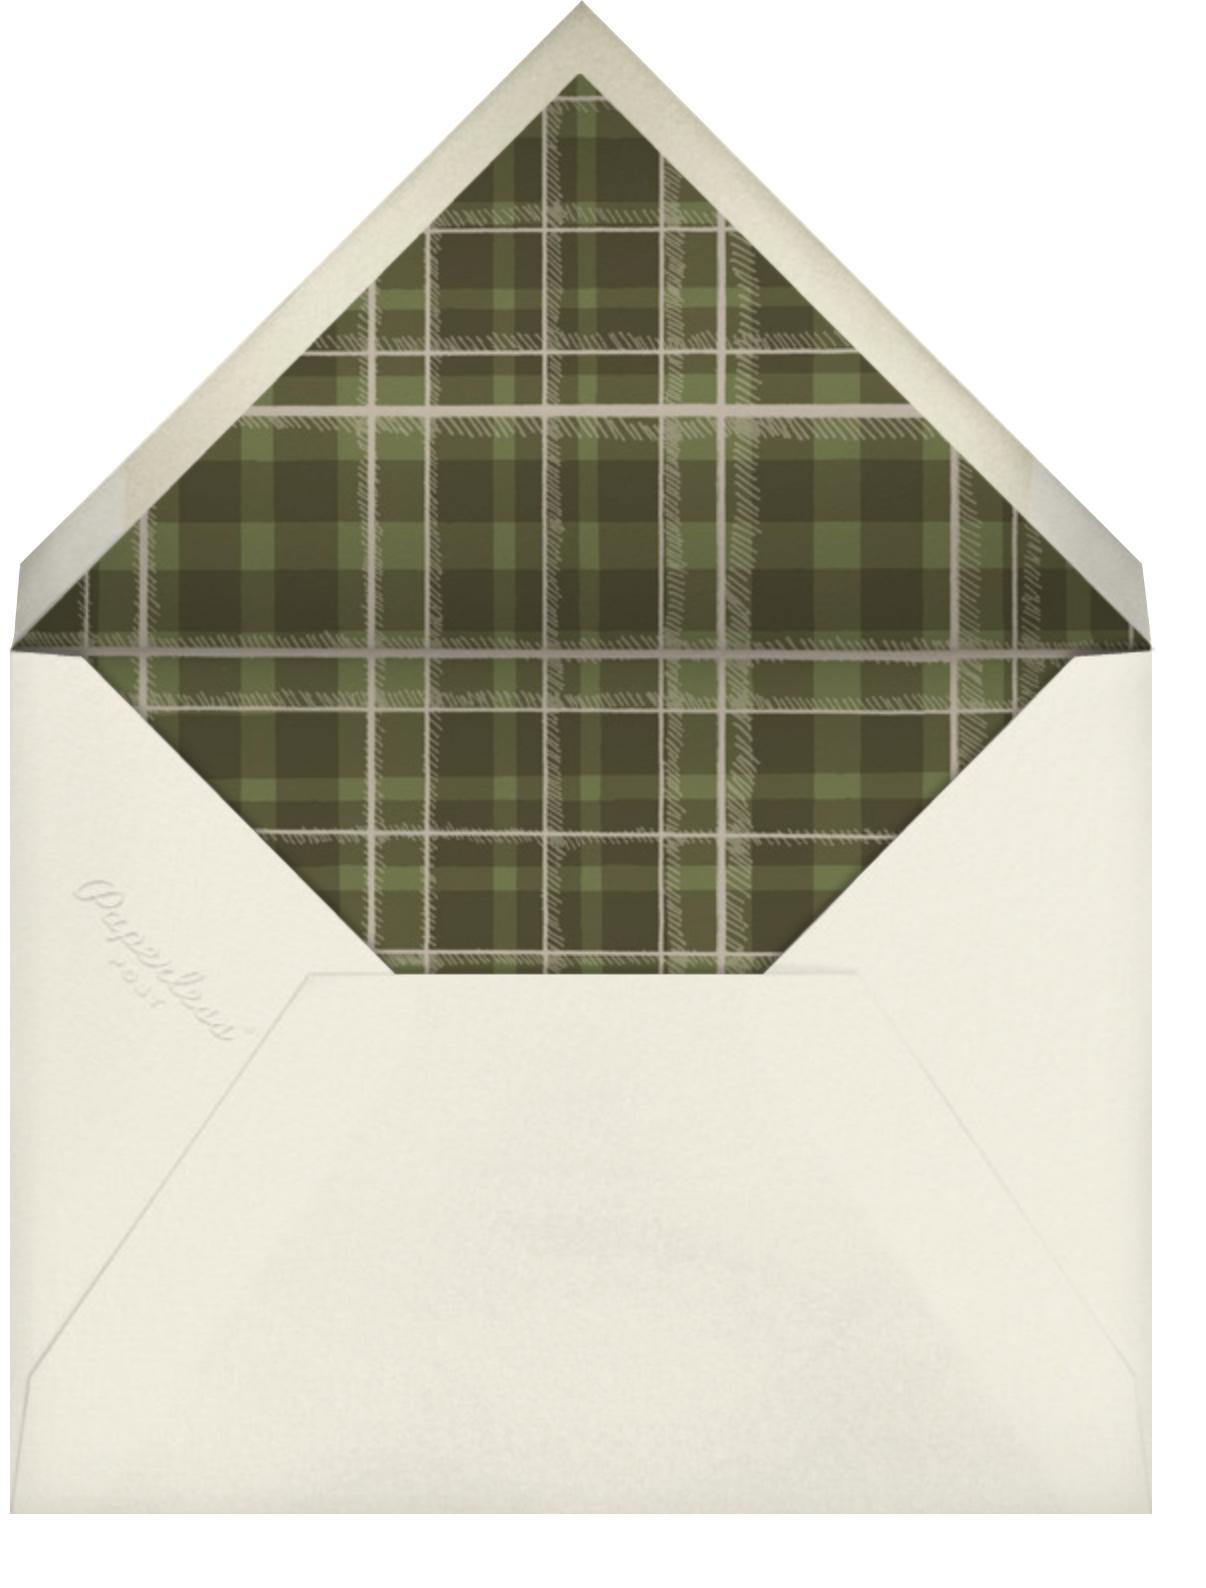 Wood Grain Dark - Square - Paperless Post - Barbecue - envelope back